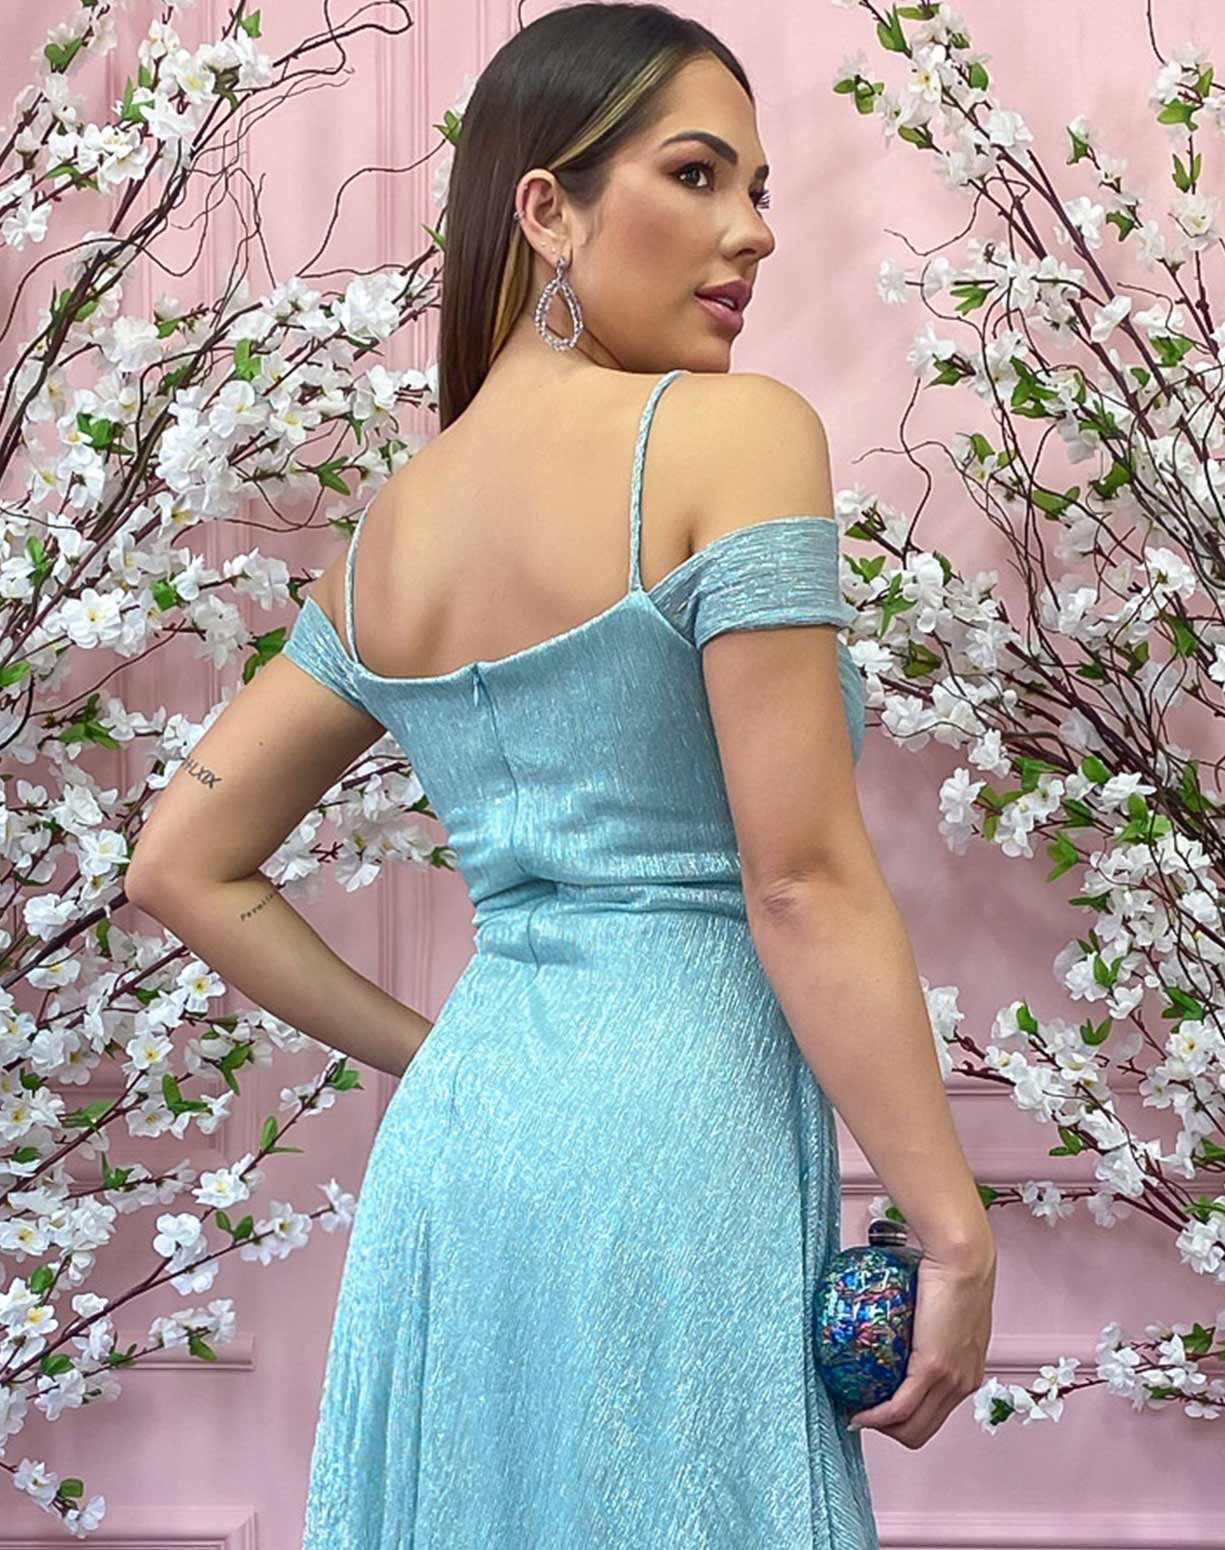 Vestido Tiffany em Tule de Lúrex com Manga Ombro a Ombro